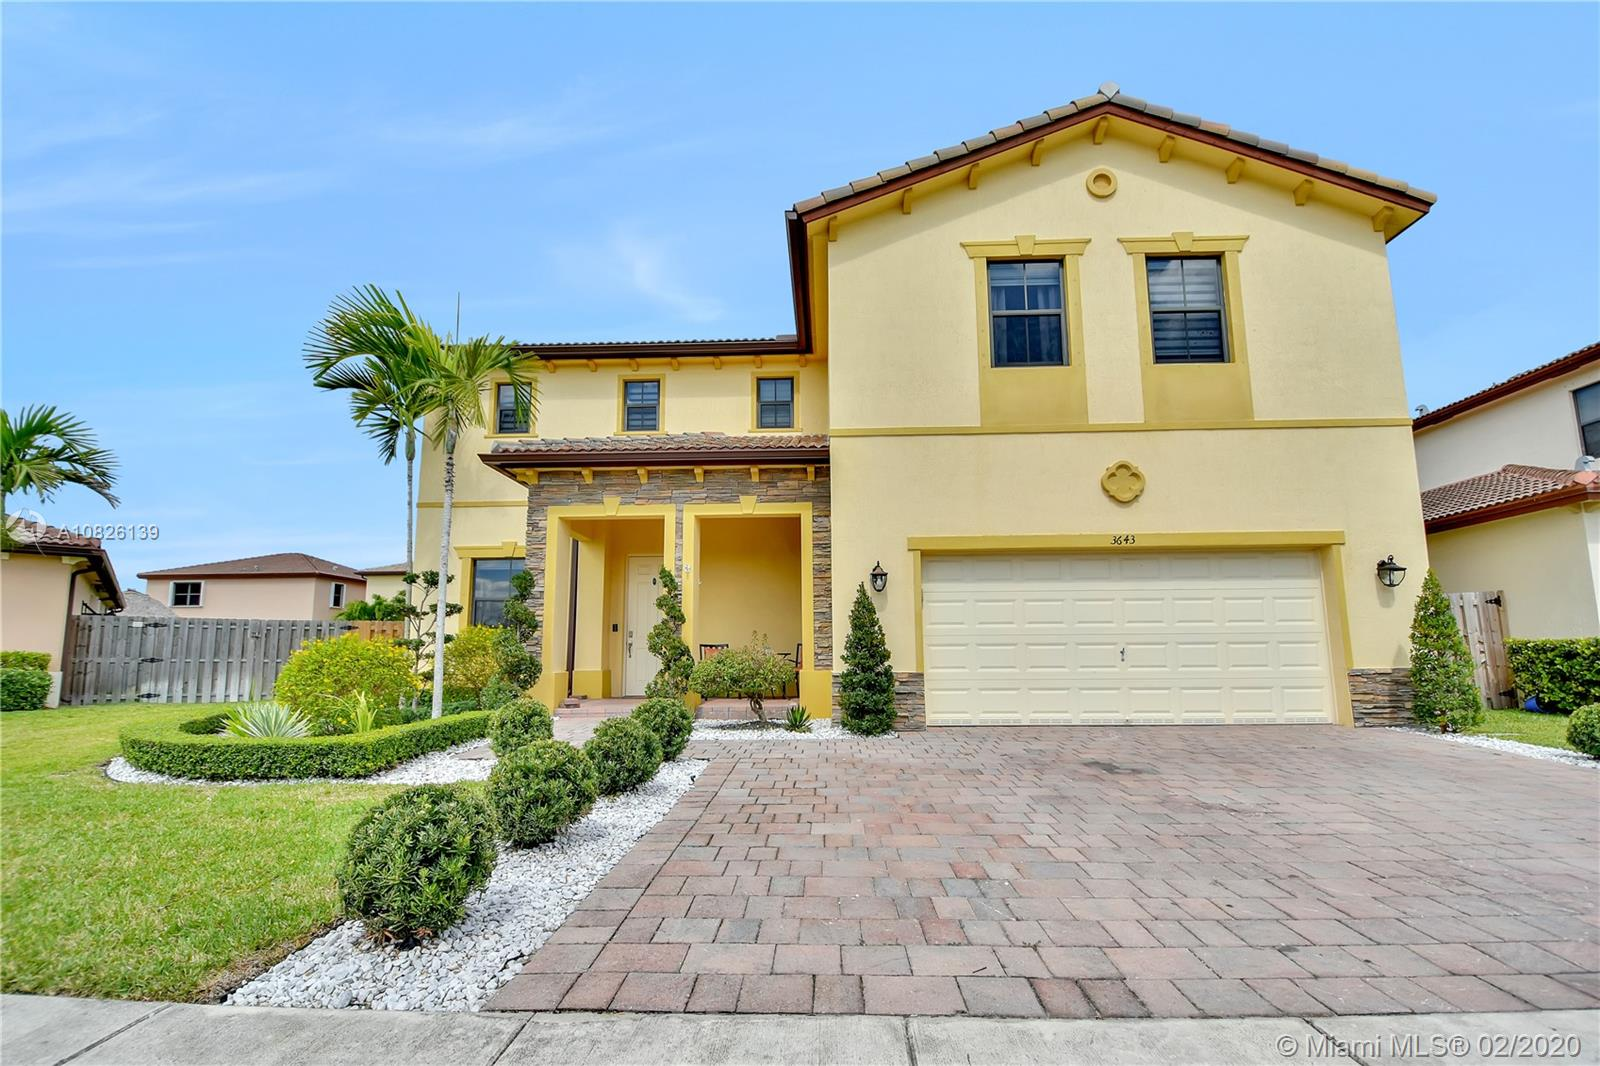 3643 SE 1st Ct, Homestead, FL 33033 - Homestead, FL real estate listing